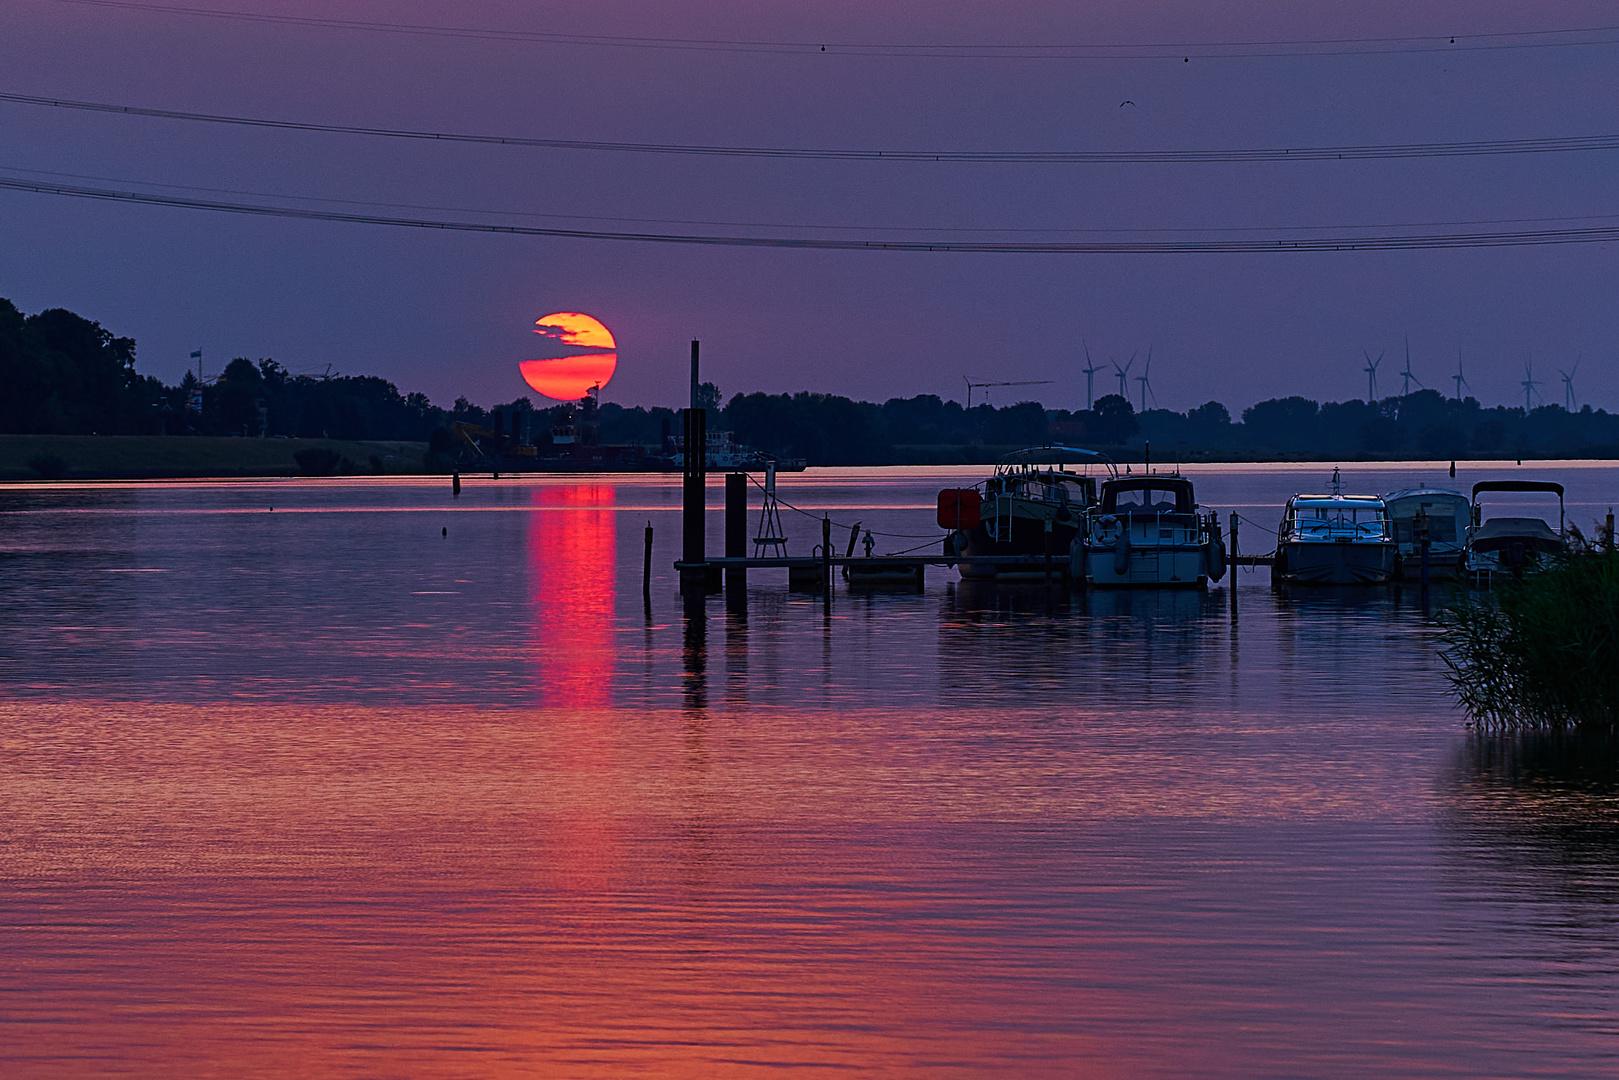 Sunset  2020-08-15  (SEL2470GM)